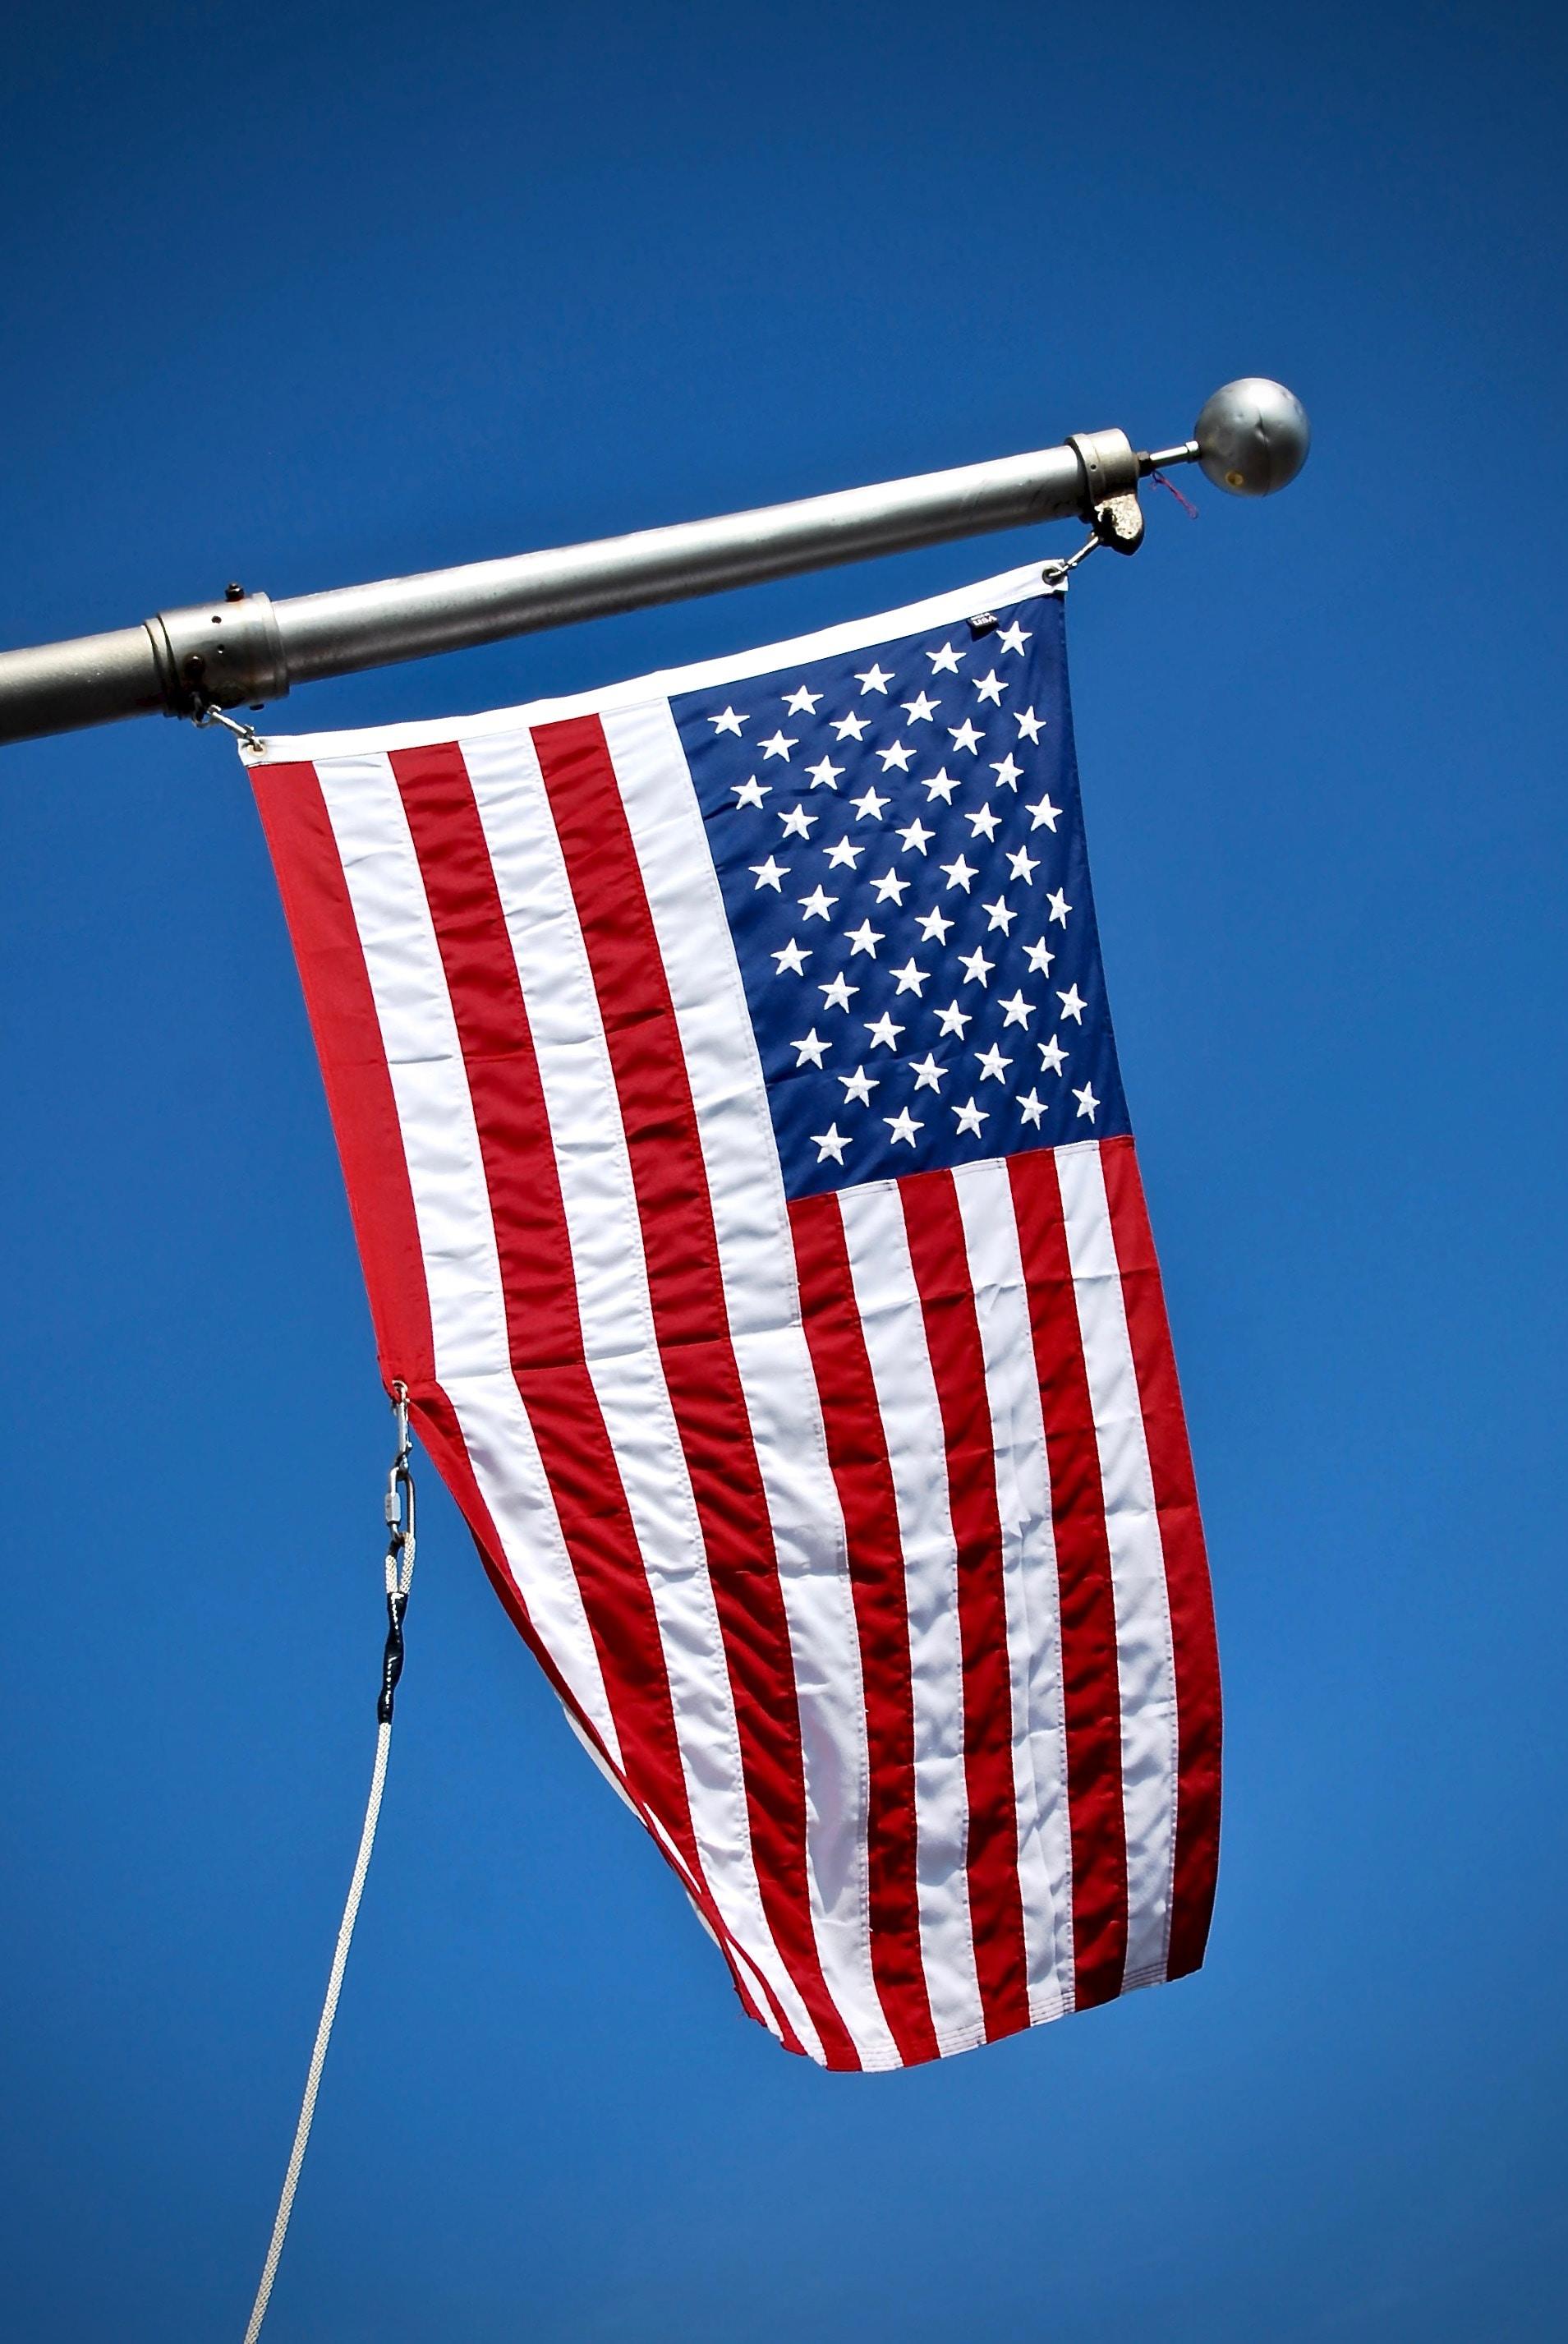 USA flag on pole